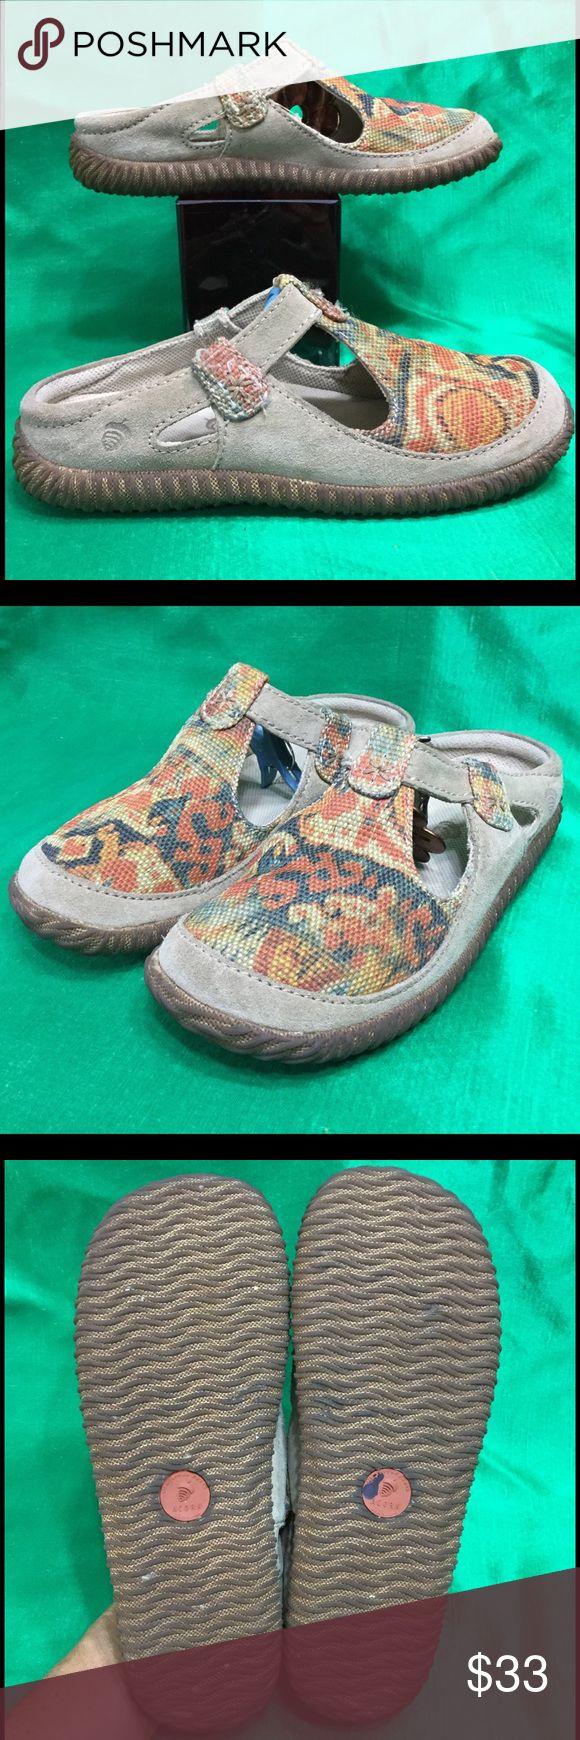 ACORN flames EARTHROAMER t strap clog/mule/slide 8 jute/suede . Rare . Cool . Clean . No issues . View HD pics for details . Acorn Shoes